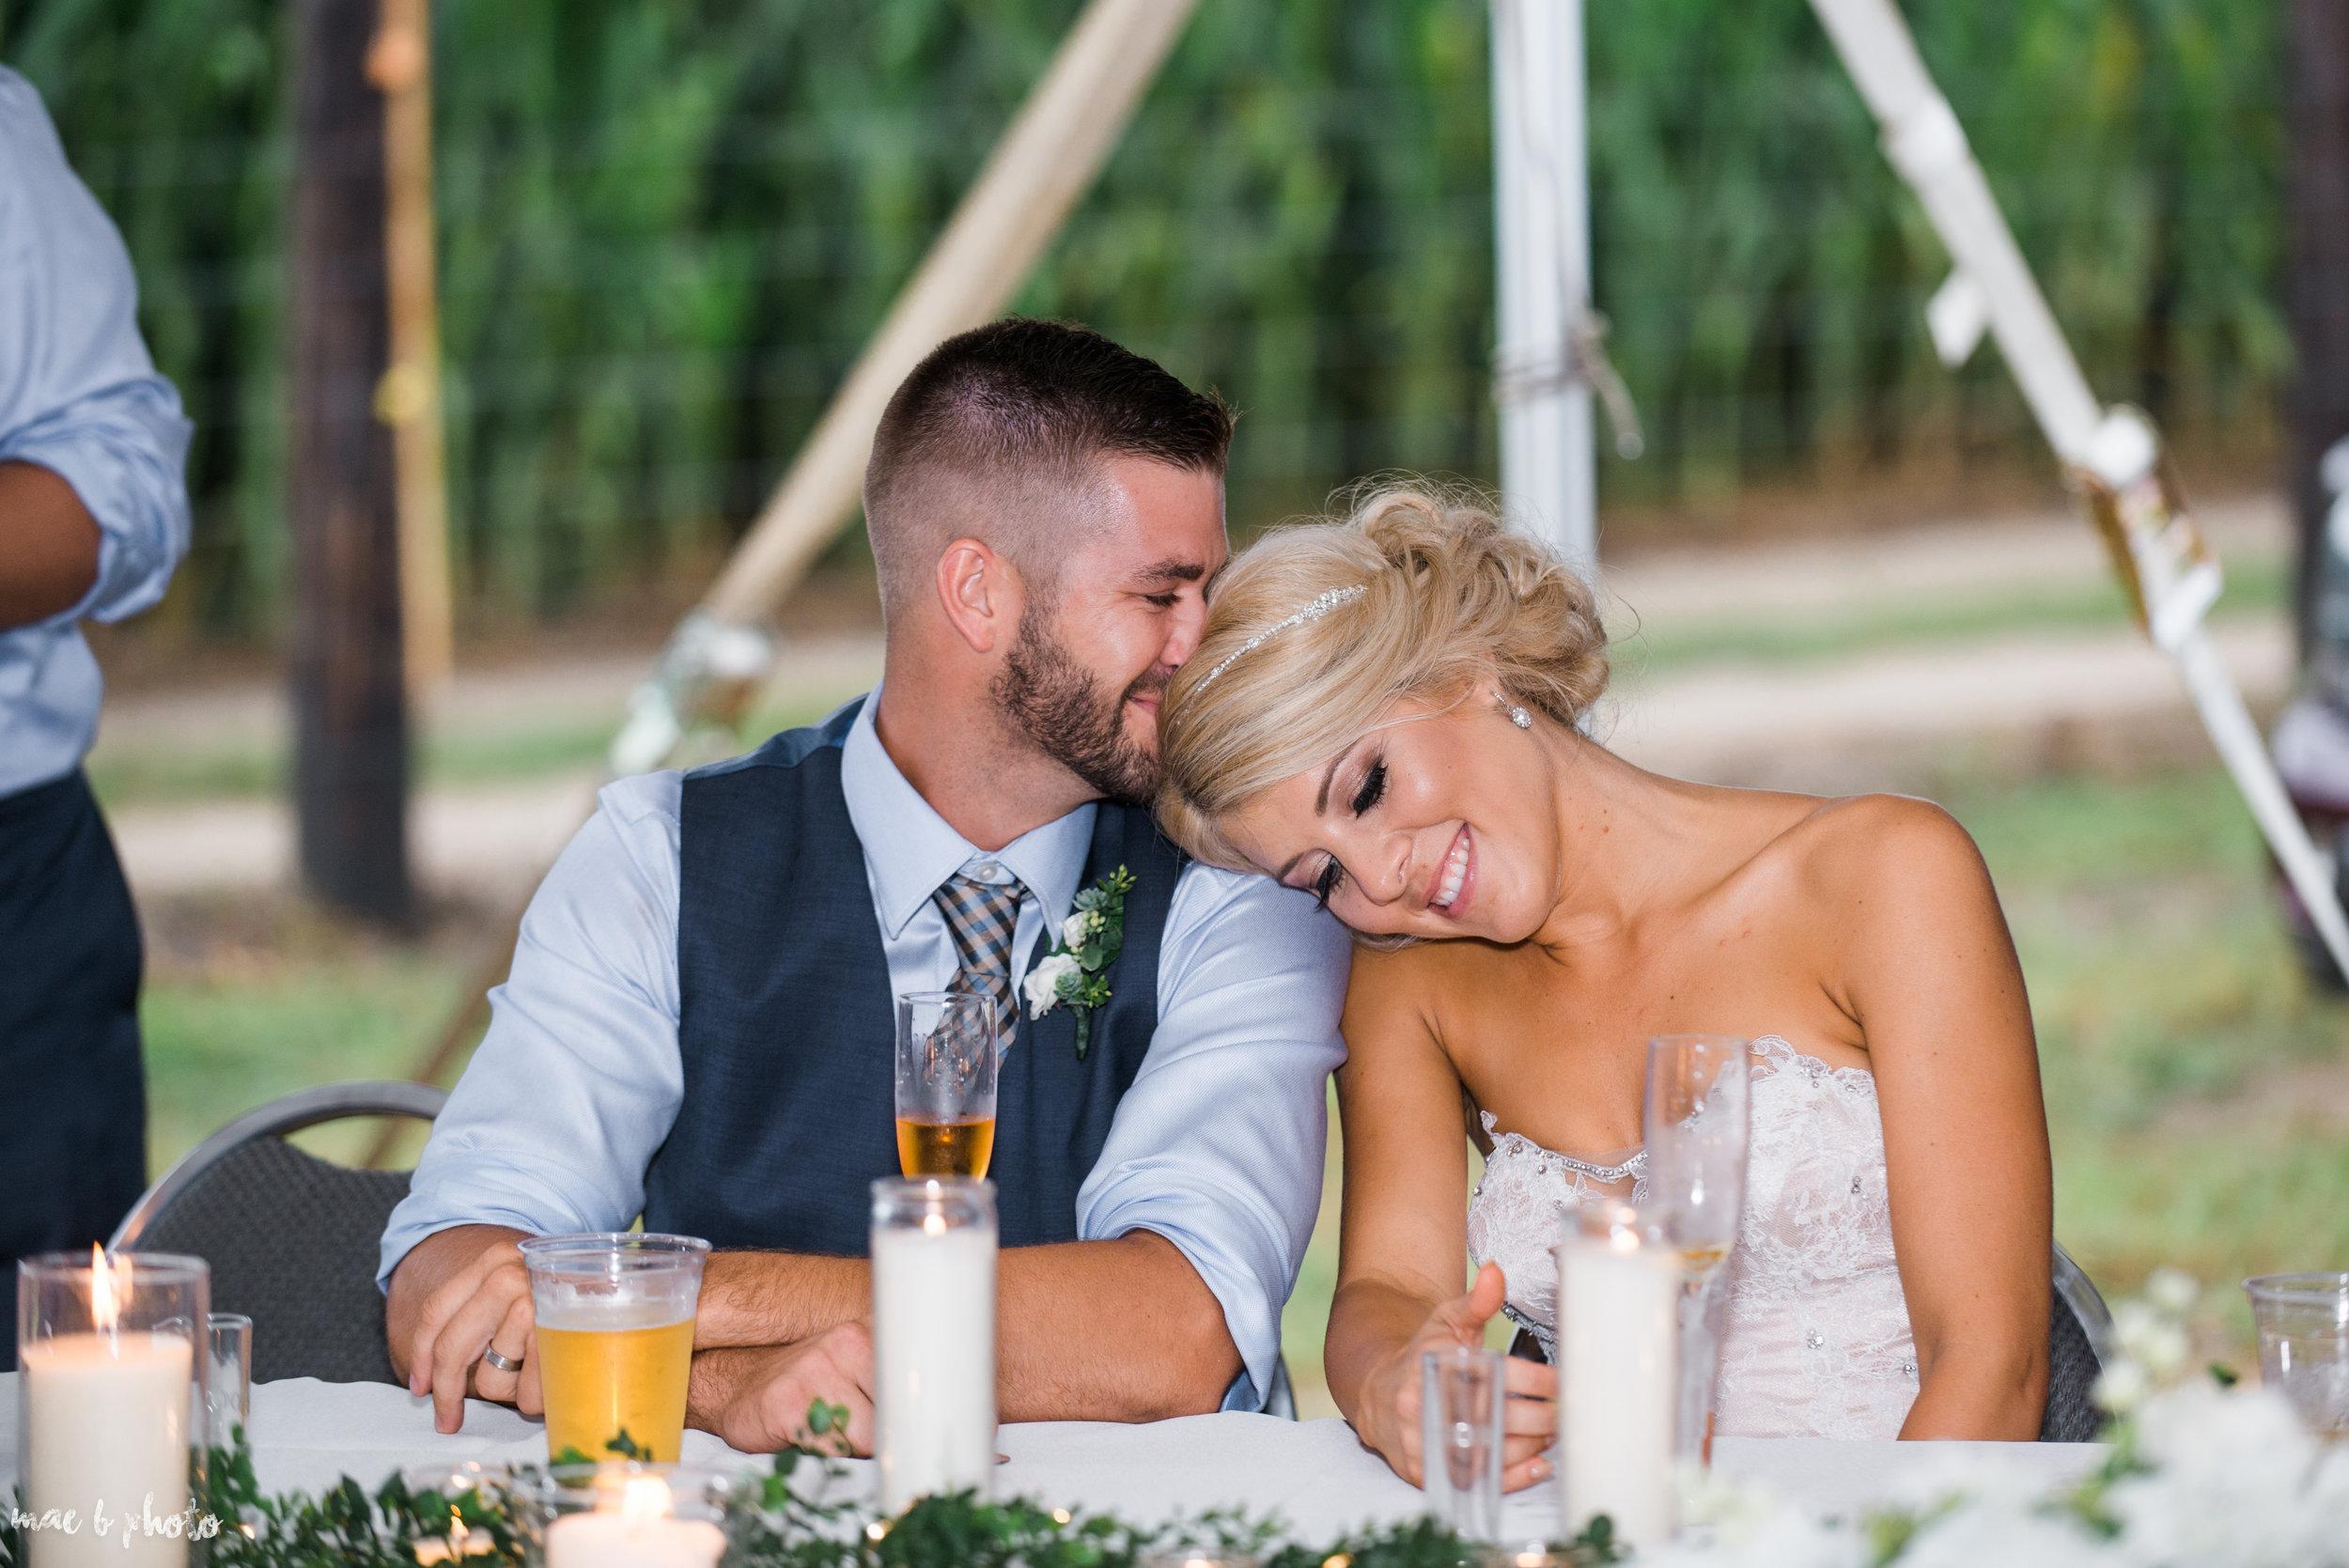 Tara & Matt's Elegant Backyard Summer Wedding in Kinsman, Ohio-91.jpg